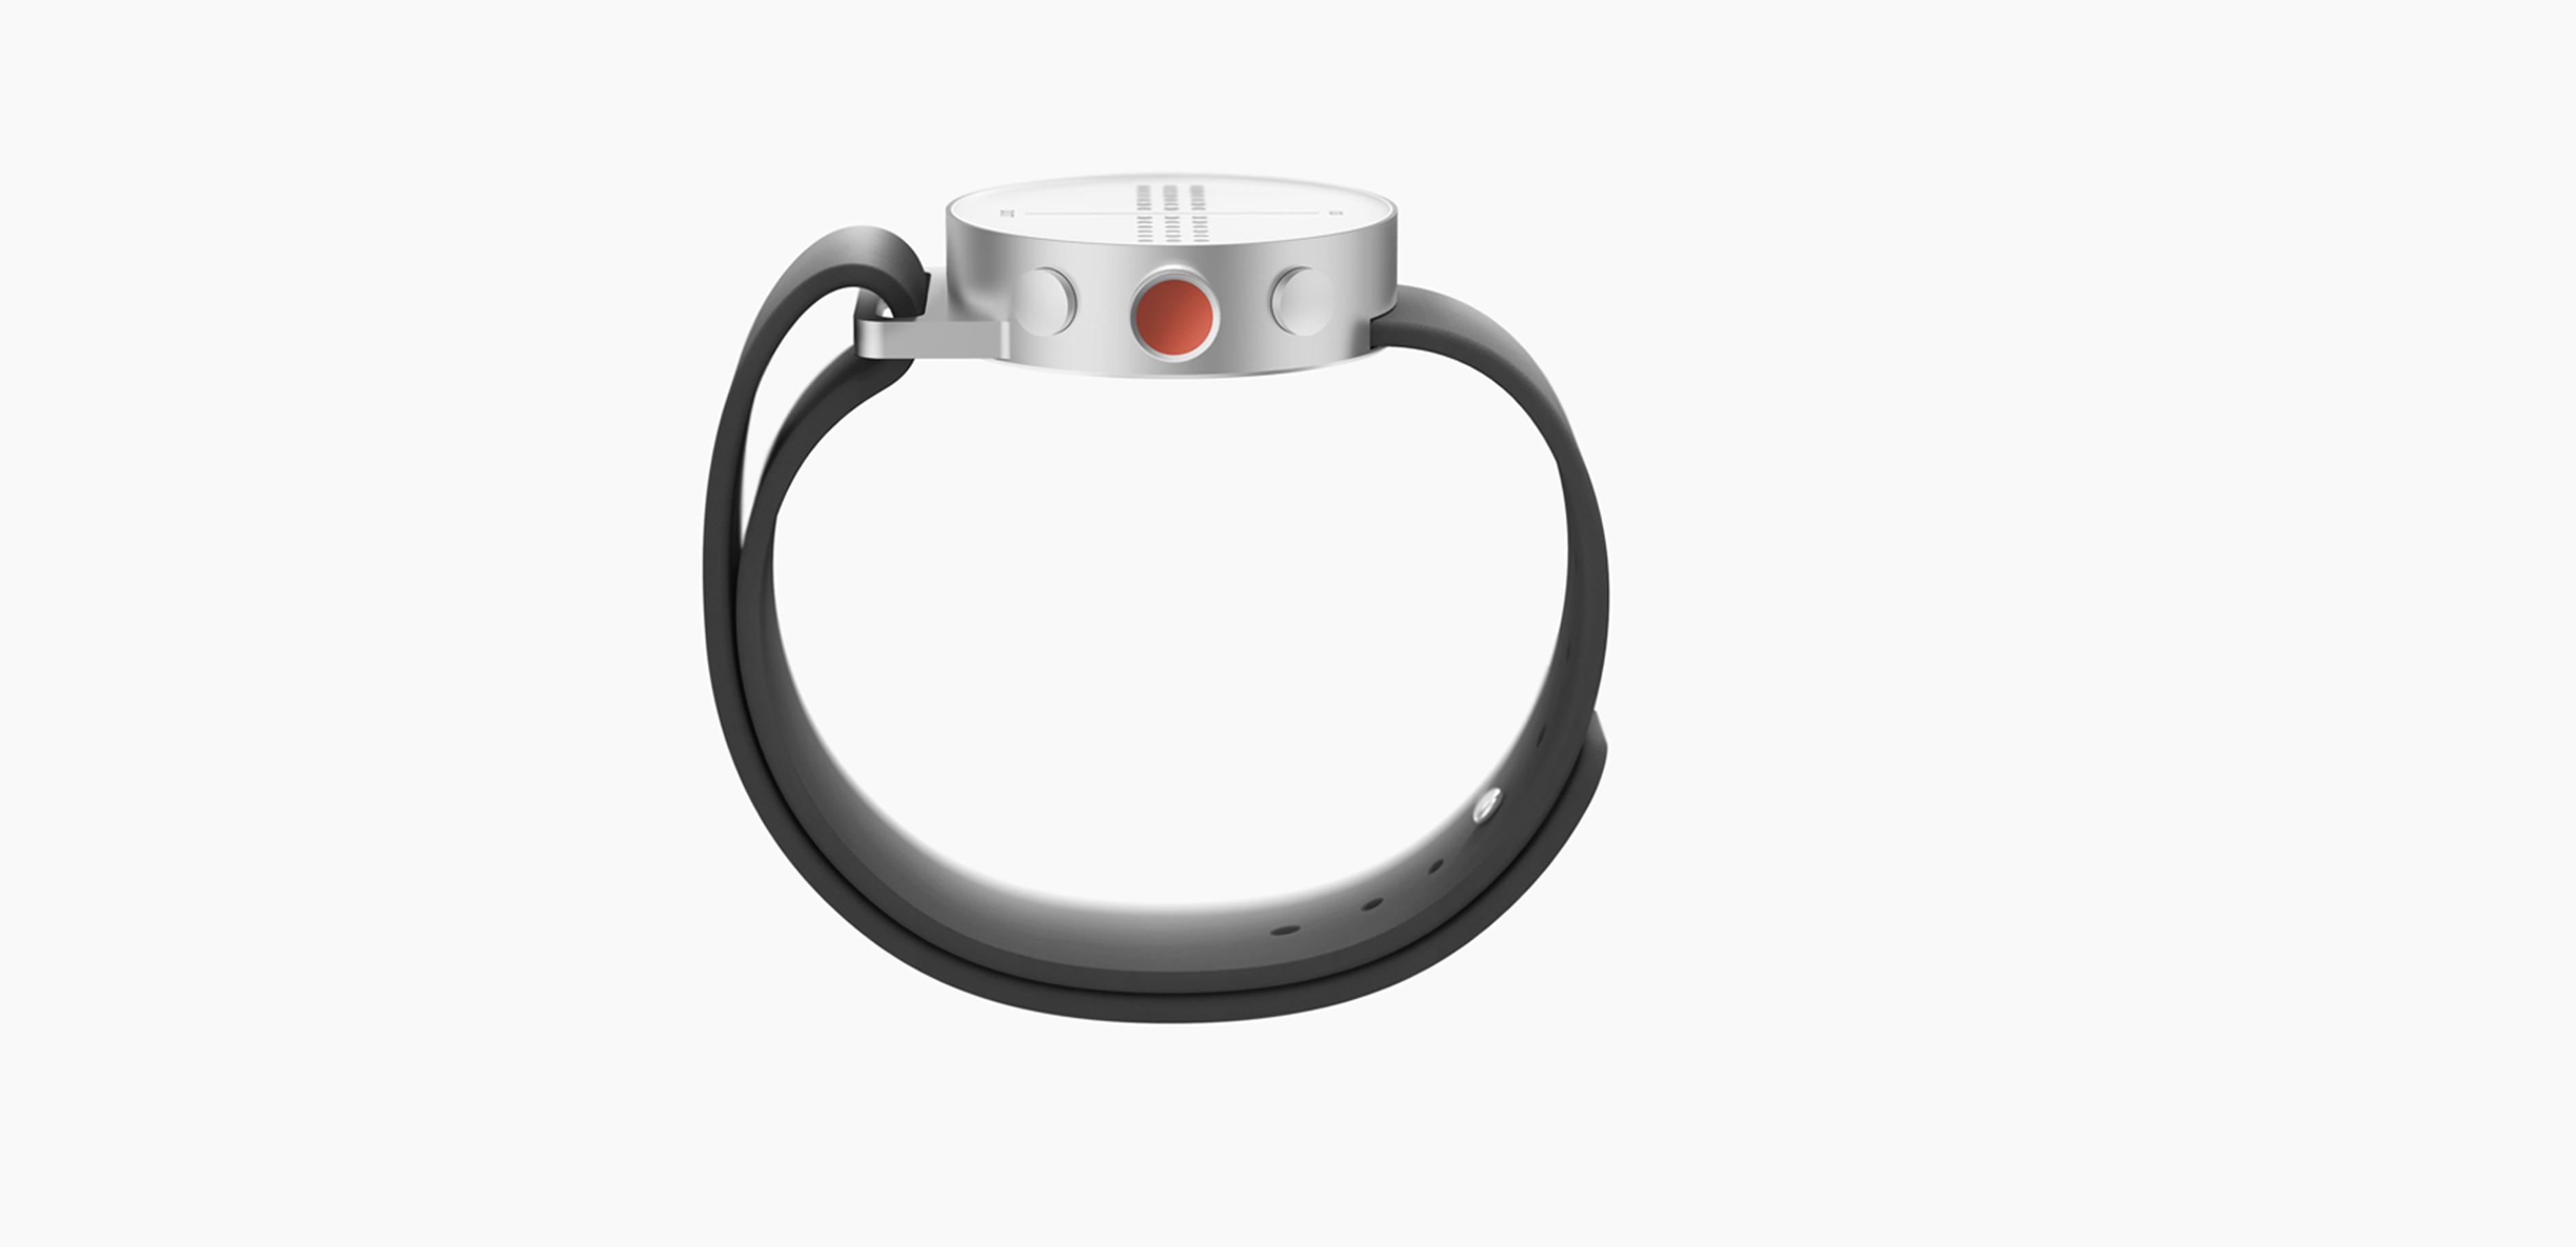 Dot smartch vista lateral botones